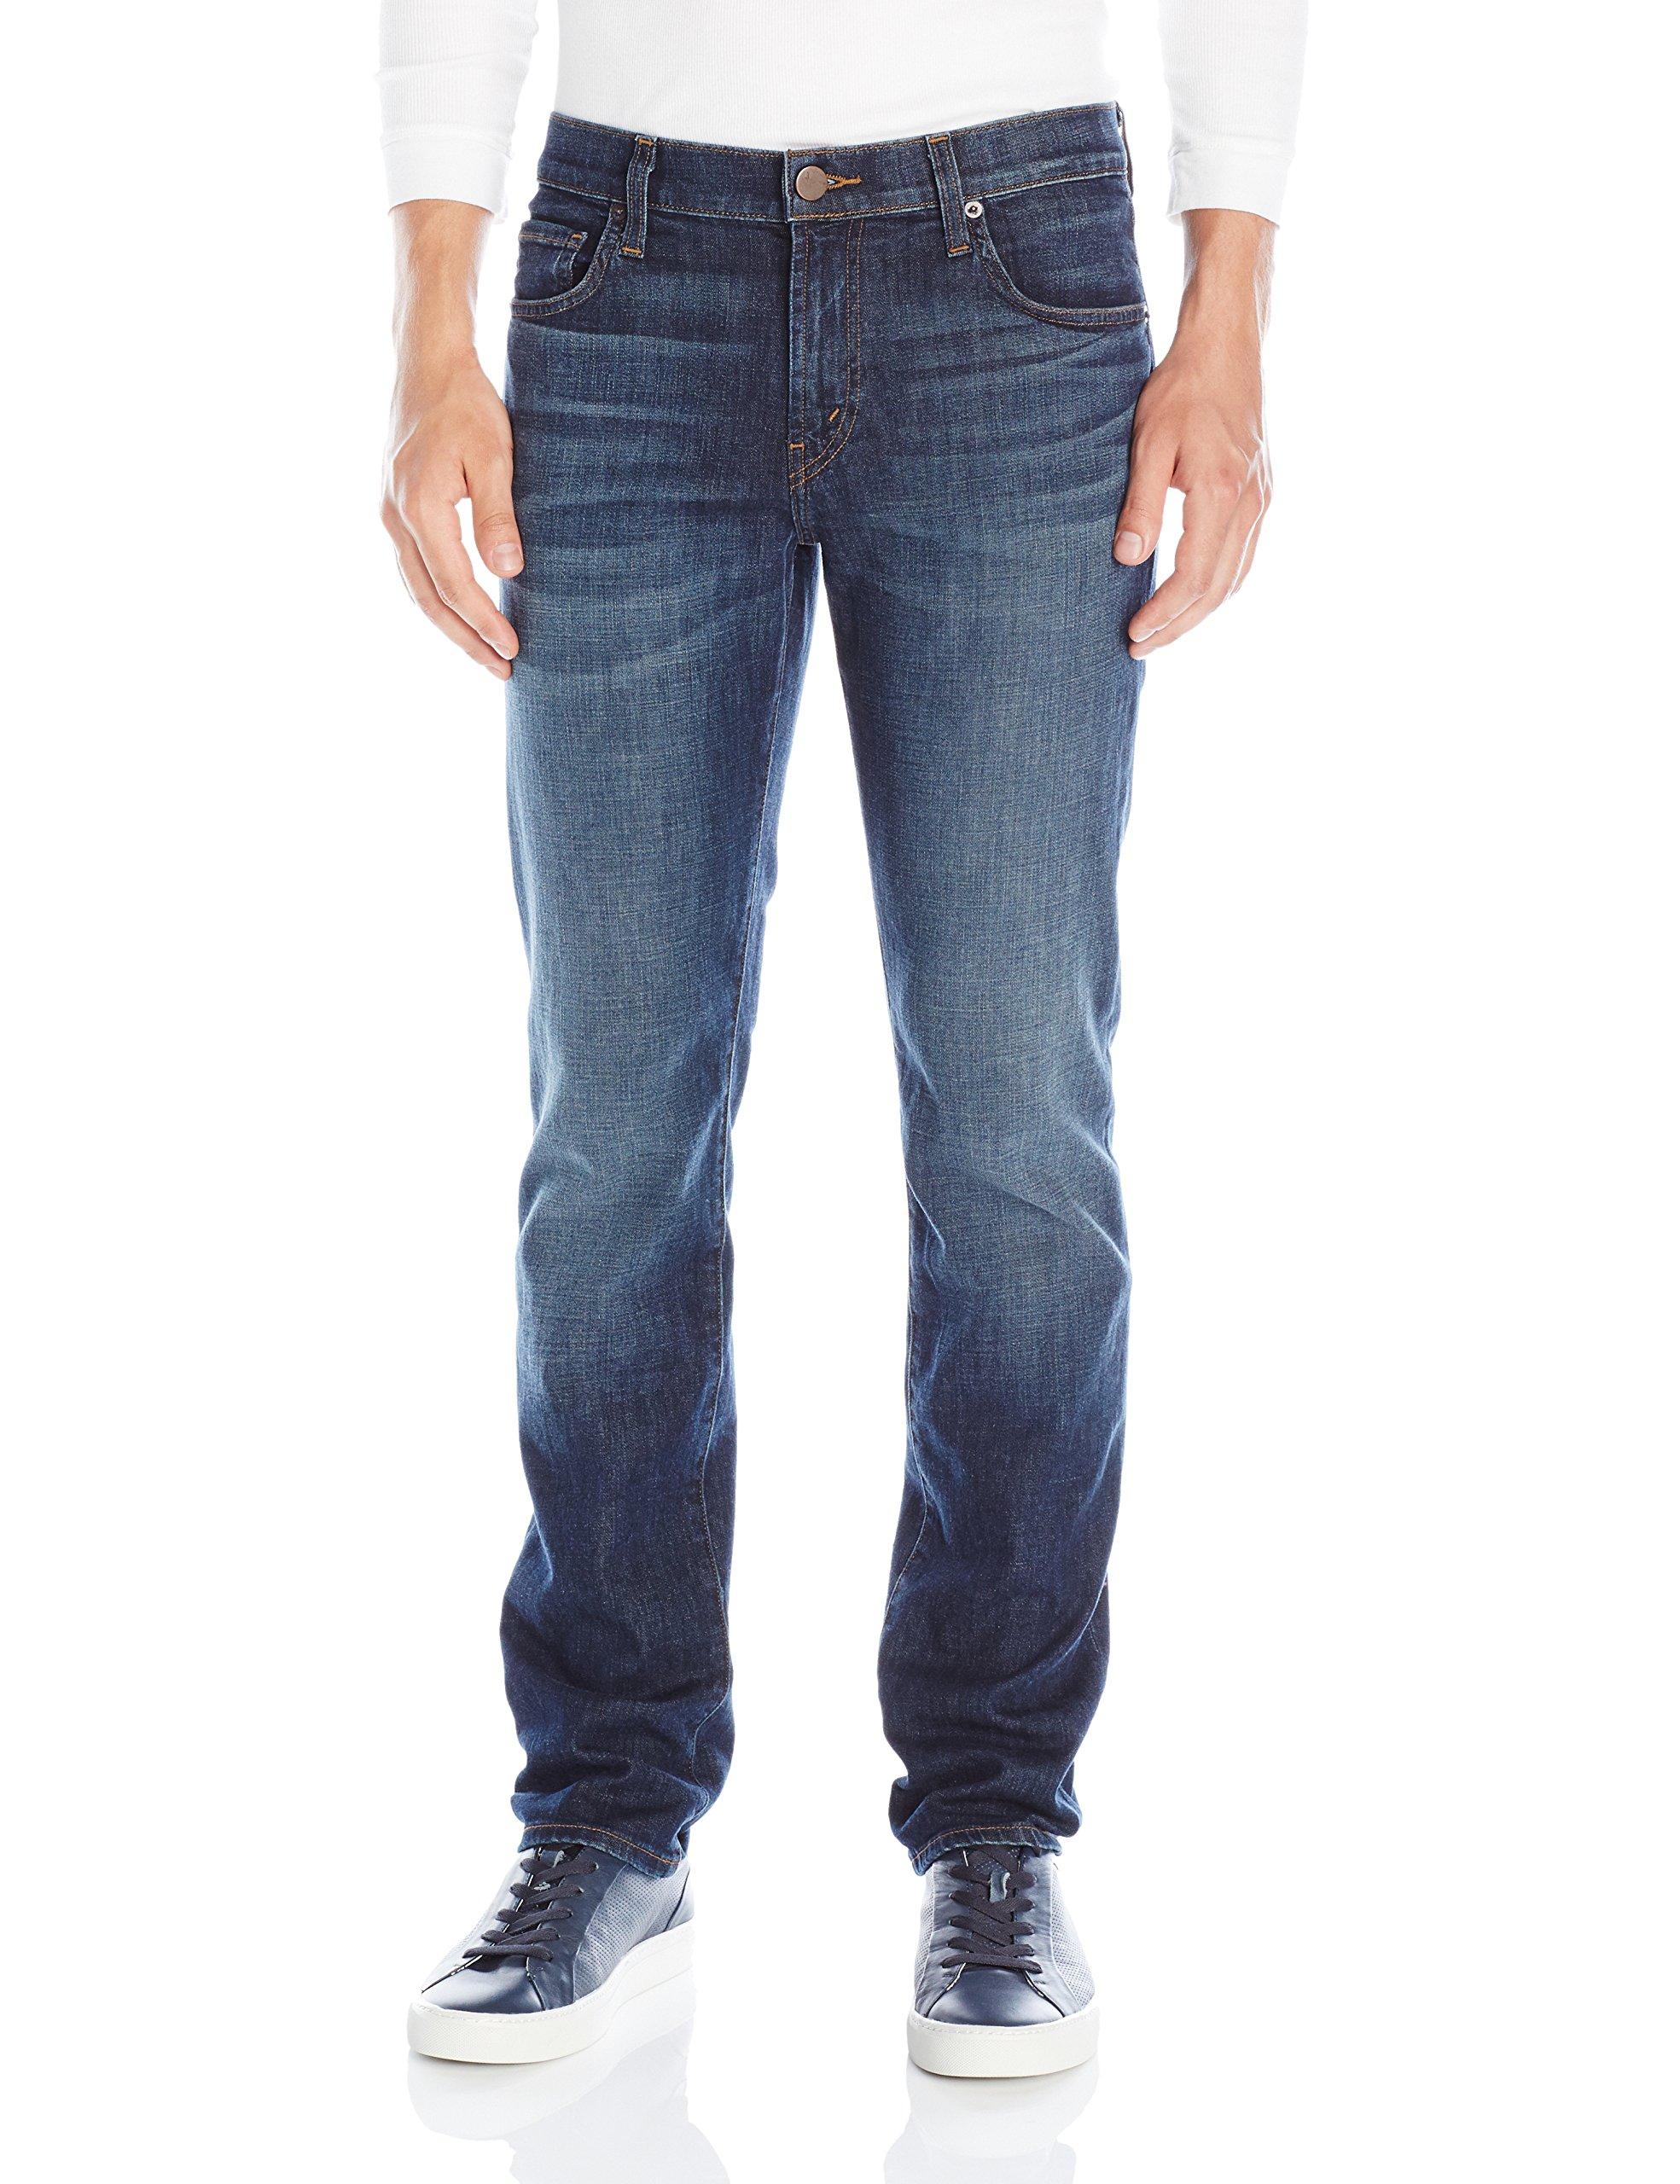 J Brand Jeans Men's Kane Straight 5 Pocket Fit, Kabru, 33